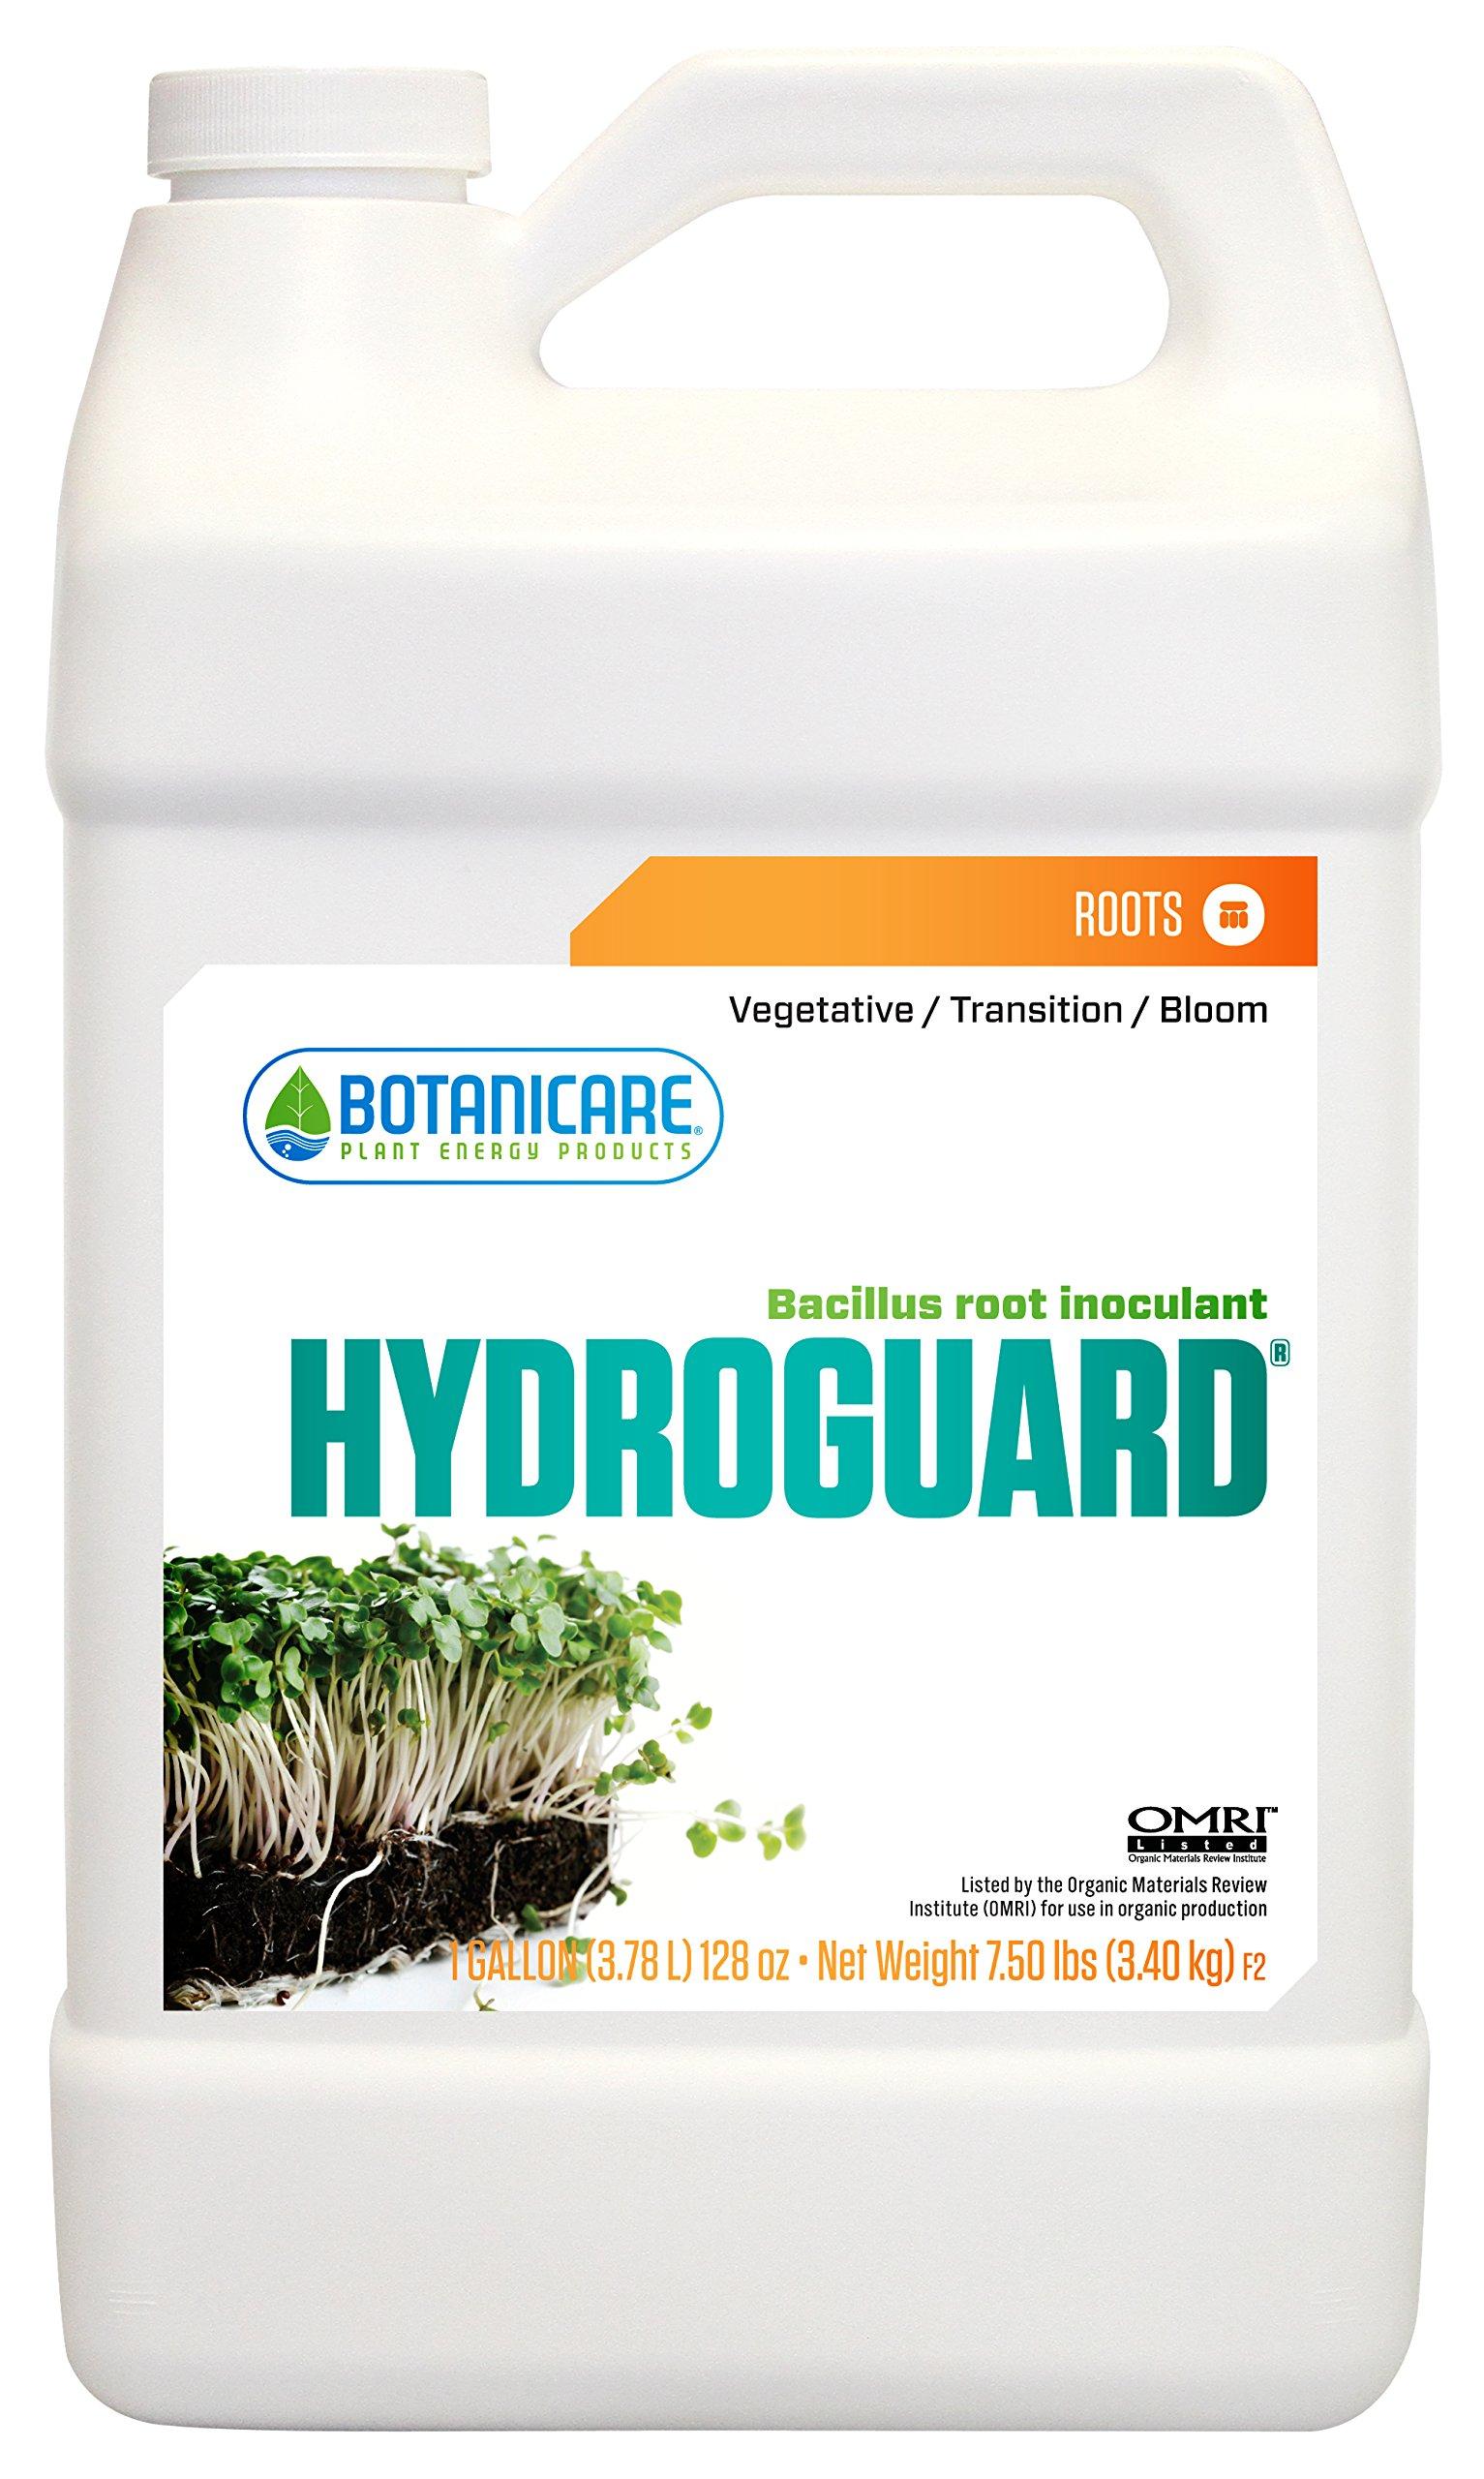 Botanicare 704080 NBHGGAL Plant Nutrient, 1-Gallon by Botanicare